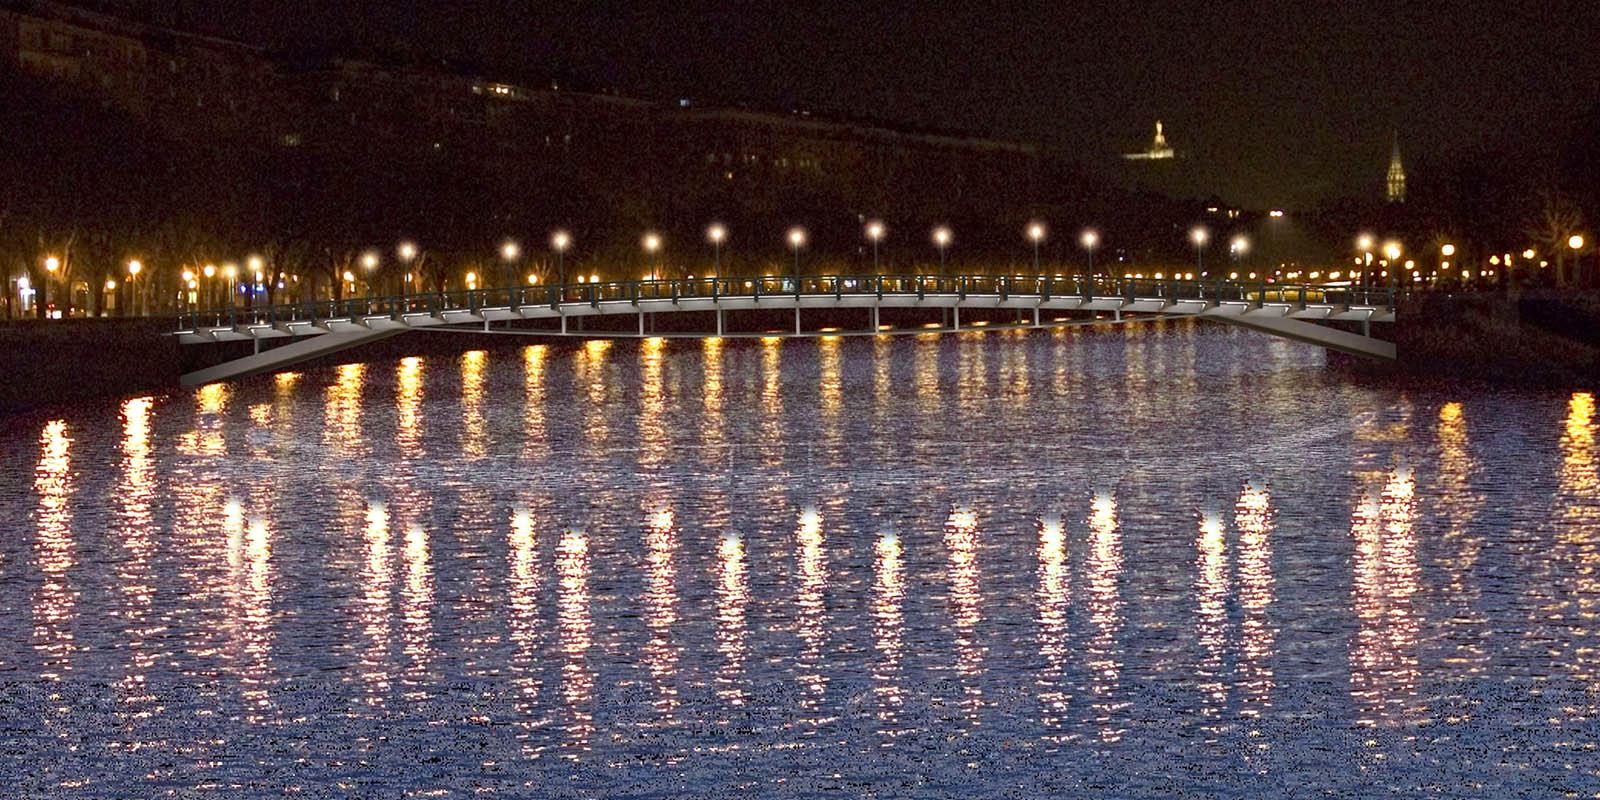 Quinto puente San Sebastian